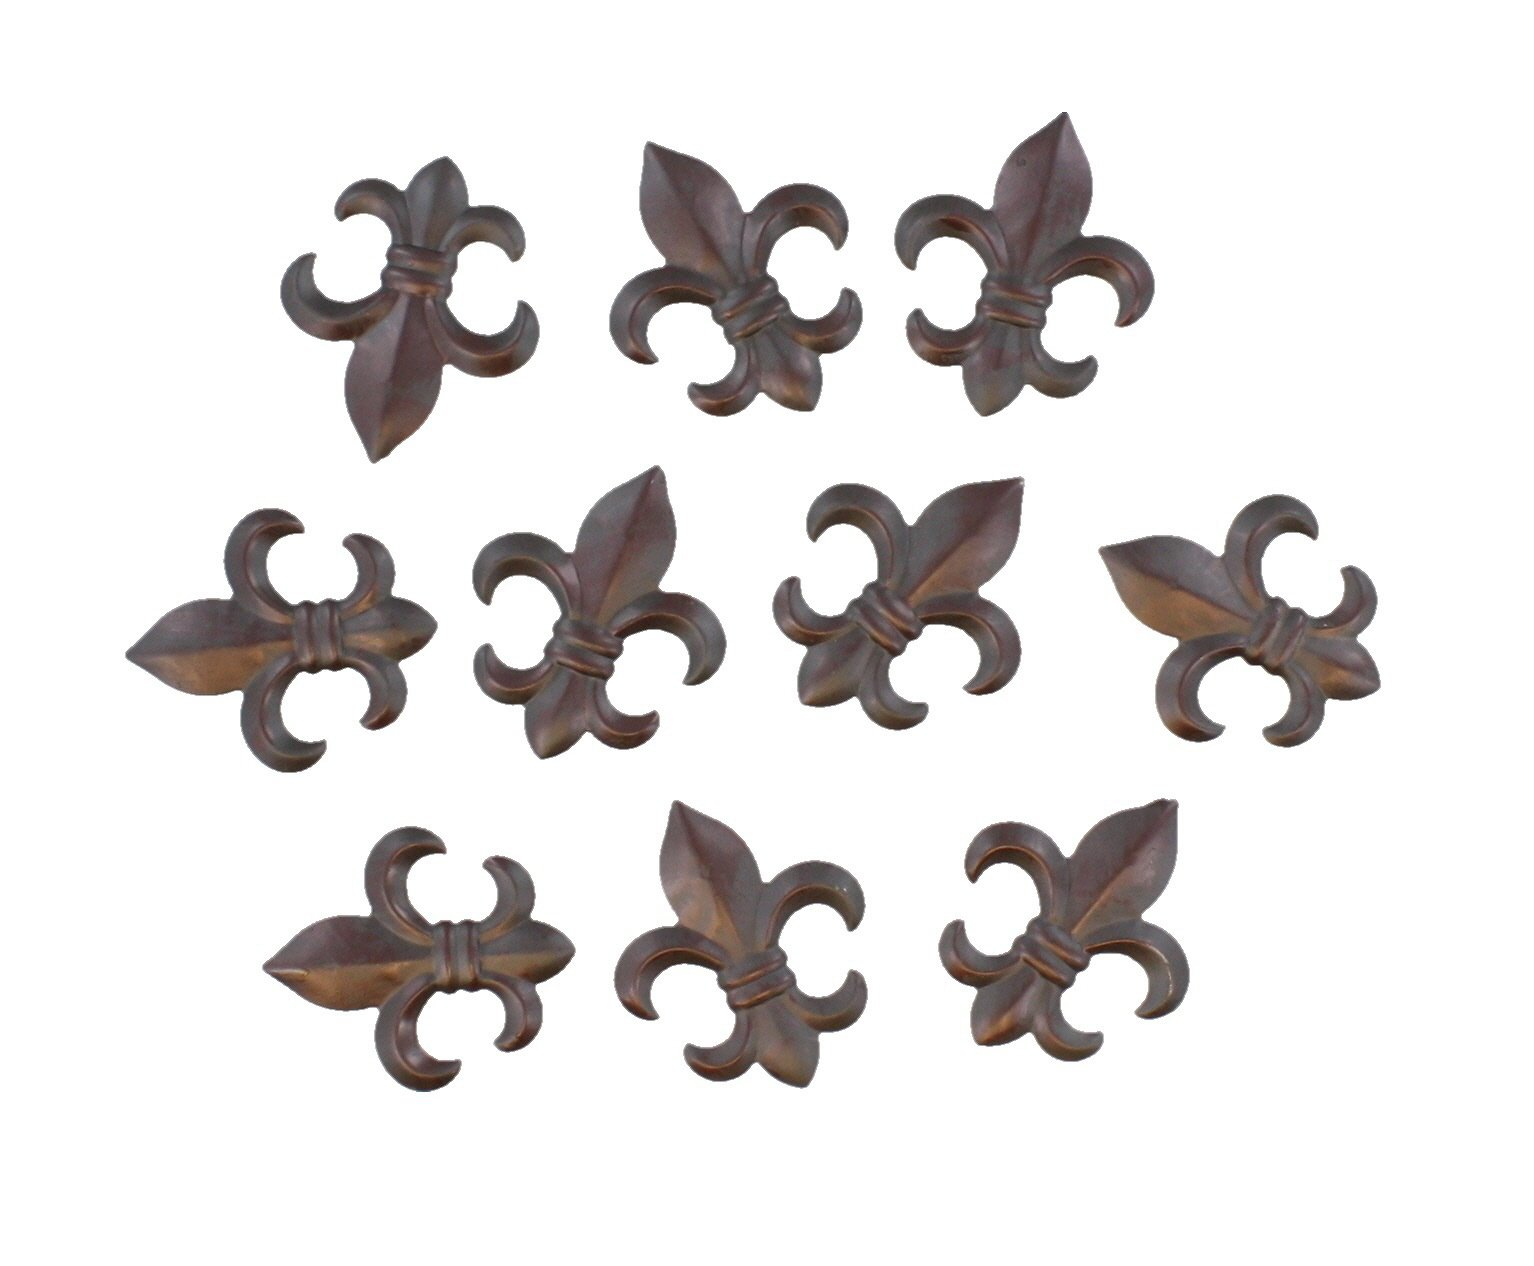 10 Pc Set - 3'' Small Rustic Metal Fleur De Lis Wall Plaques / Ornaments - Creole Tuscan Saints Decor